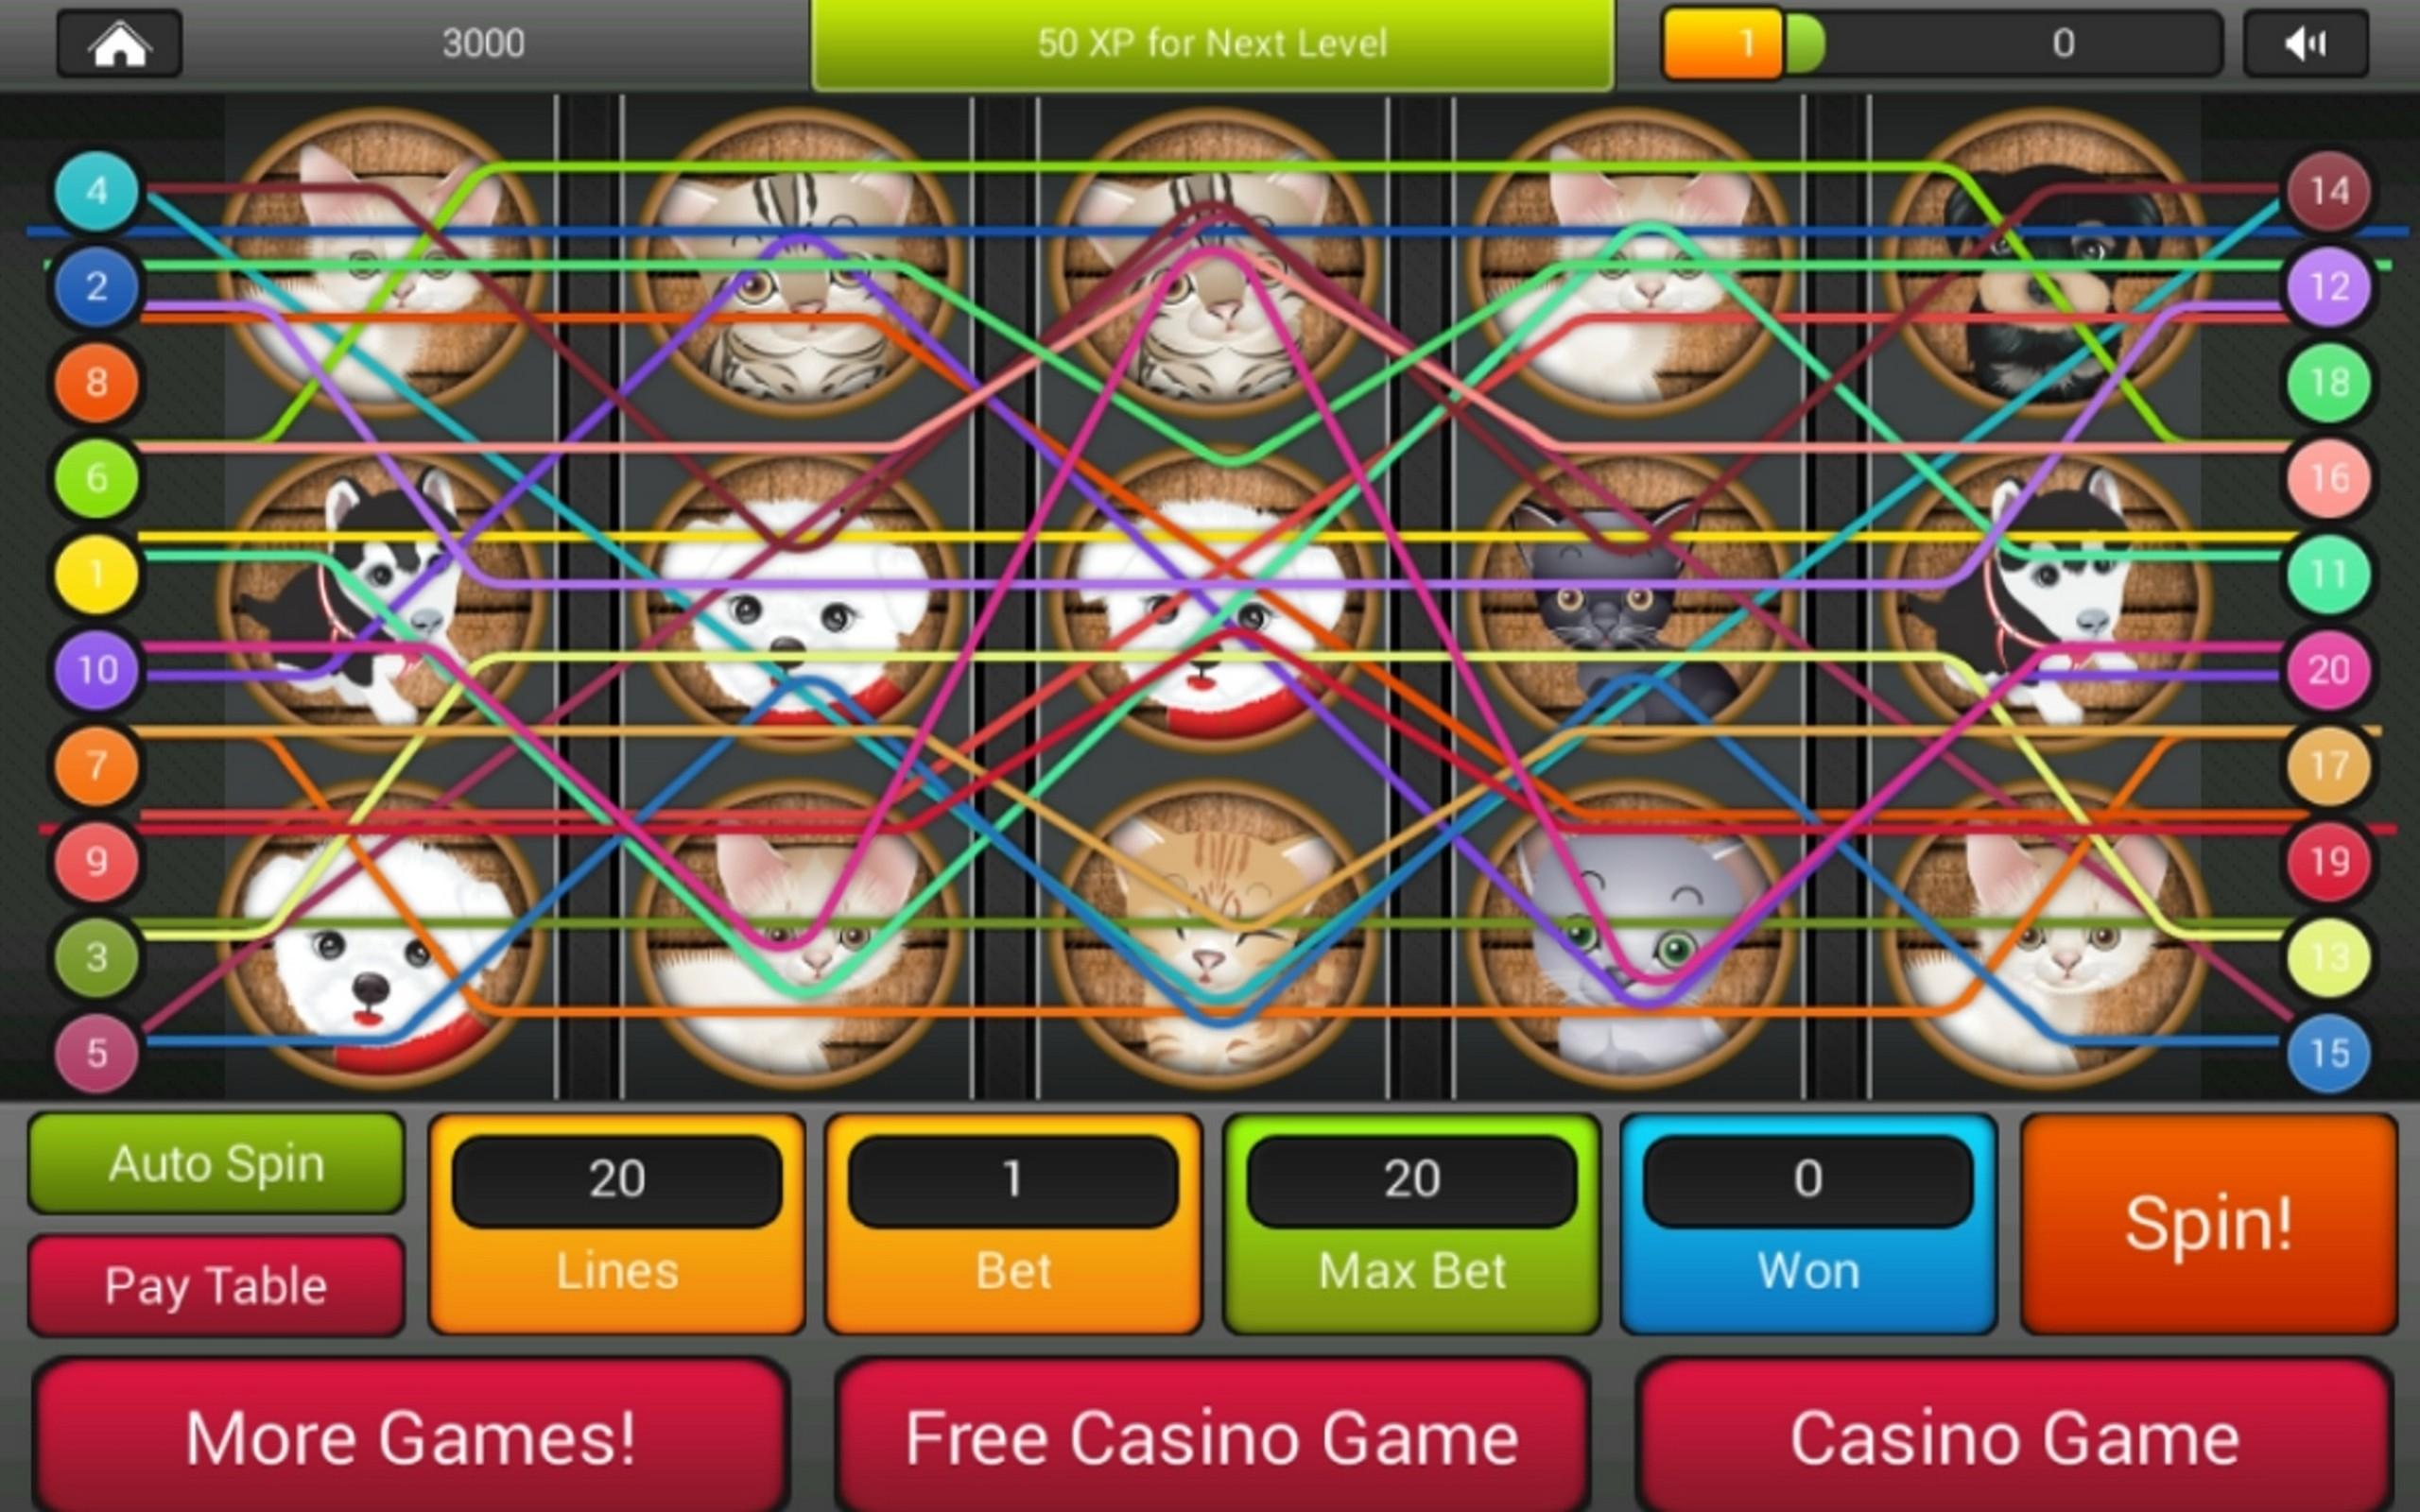 Choose to Play Mobile or Desktop Version